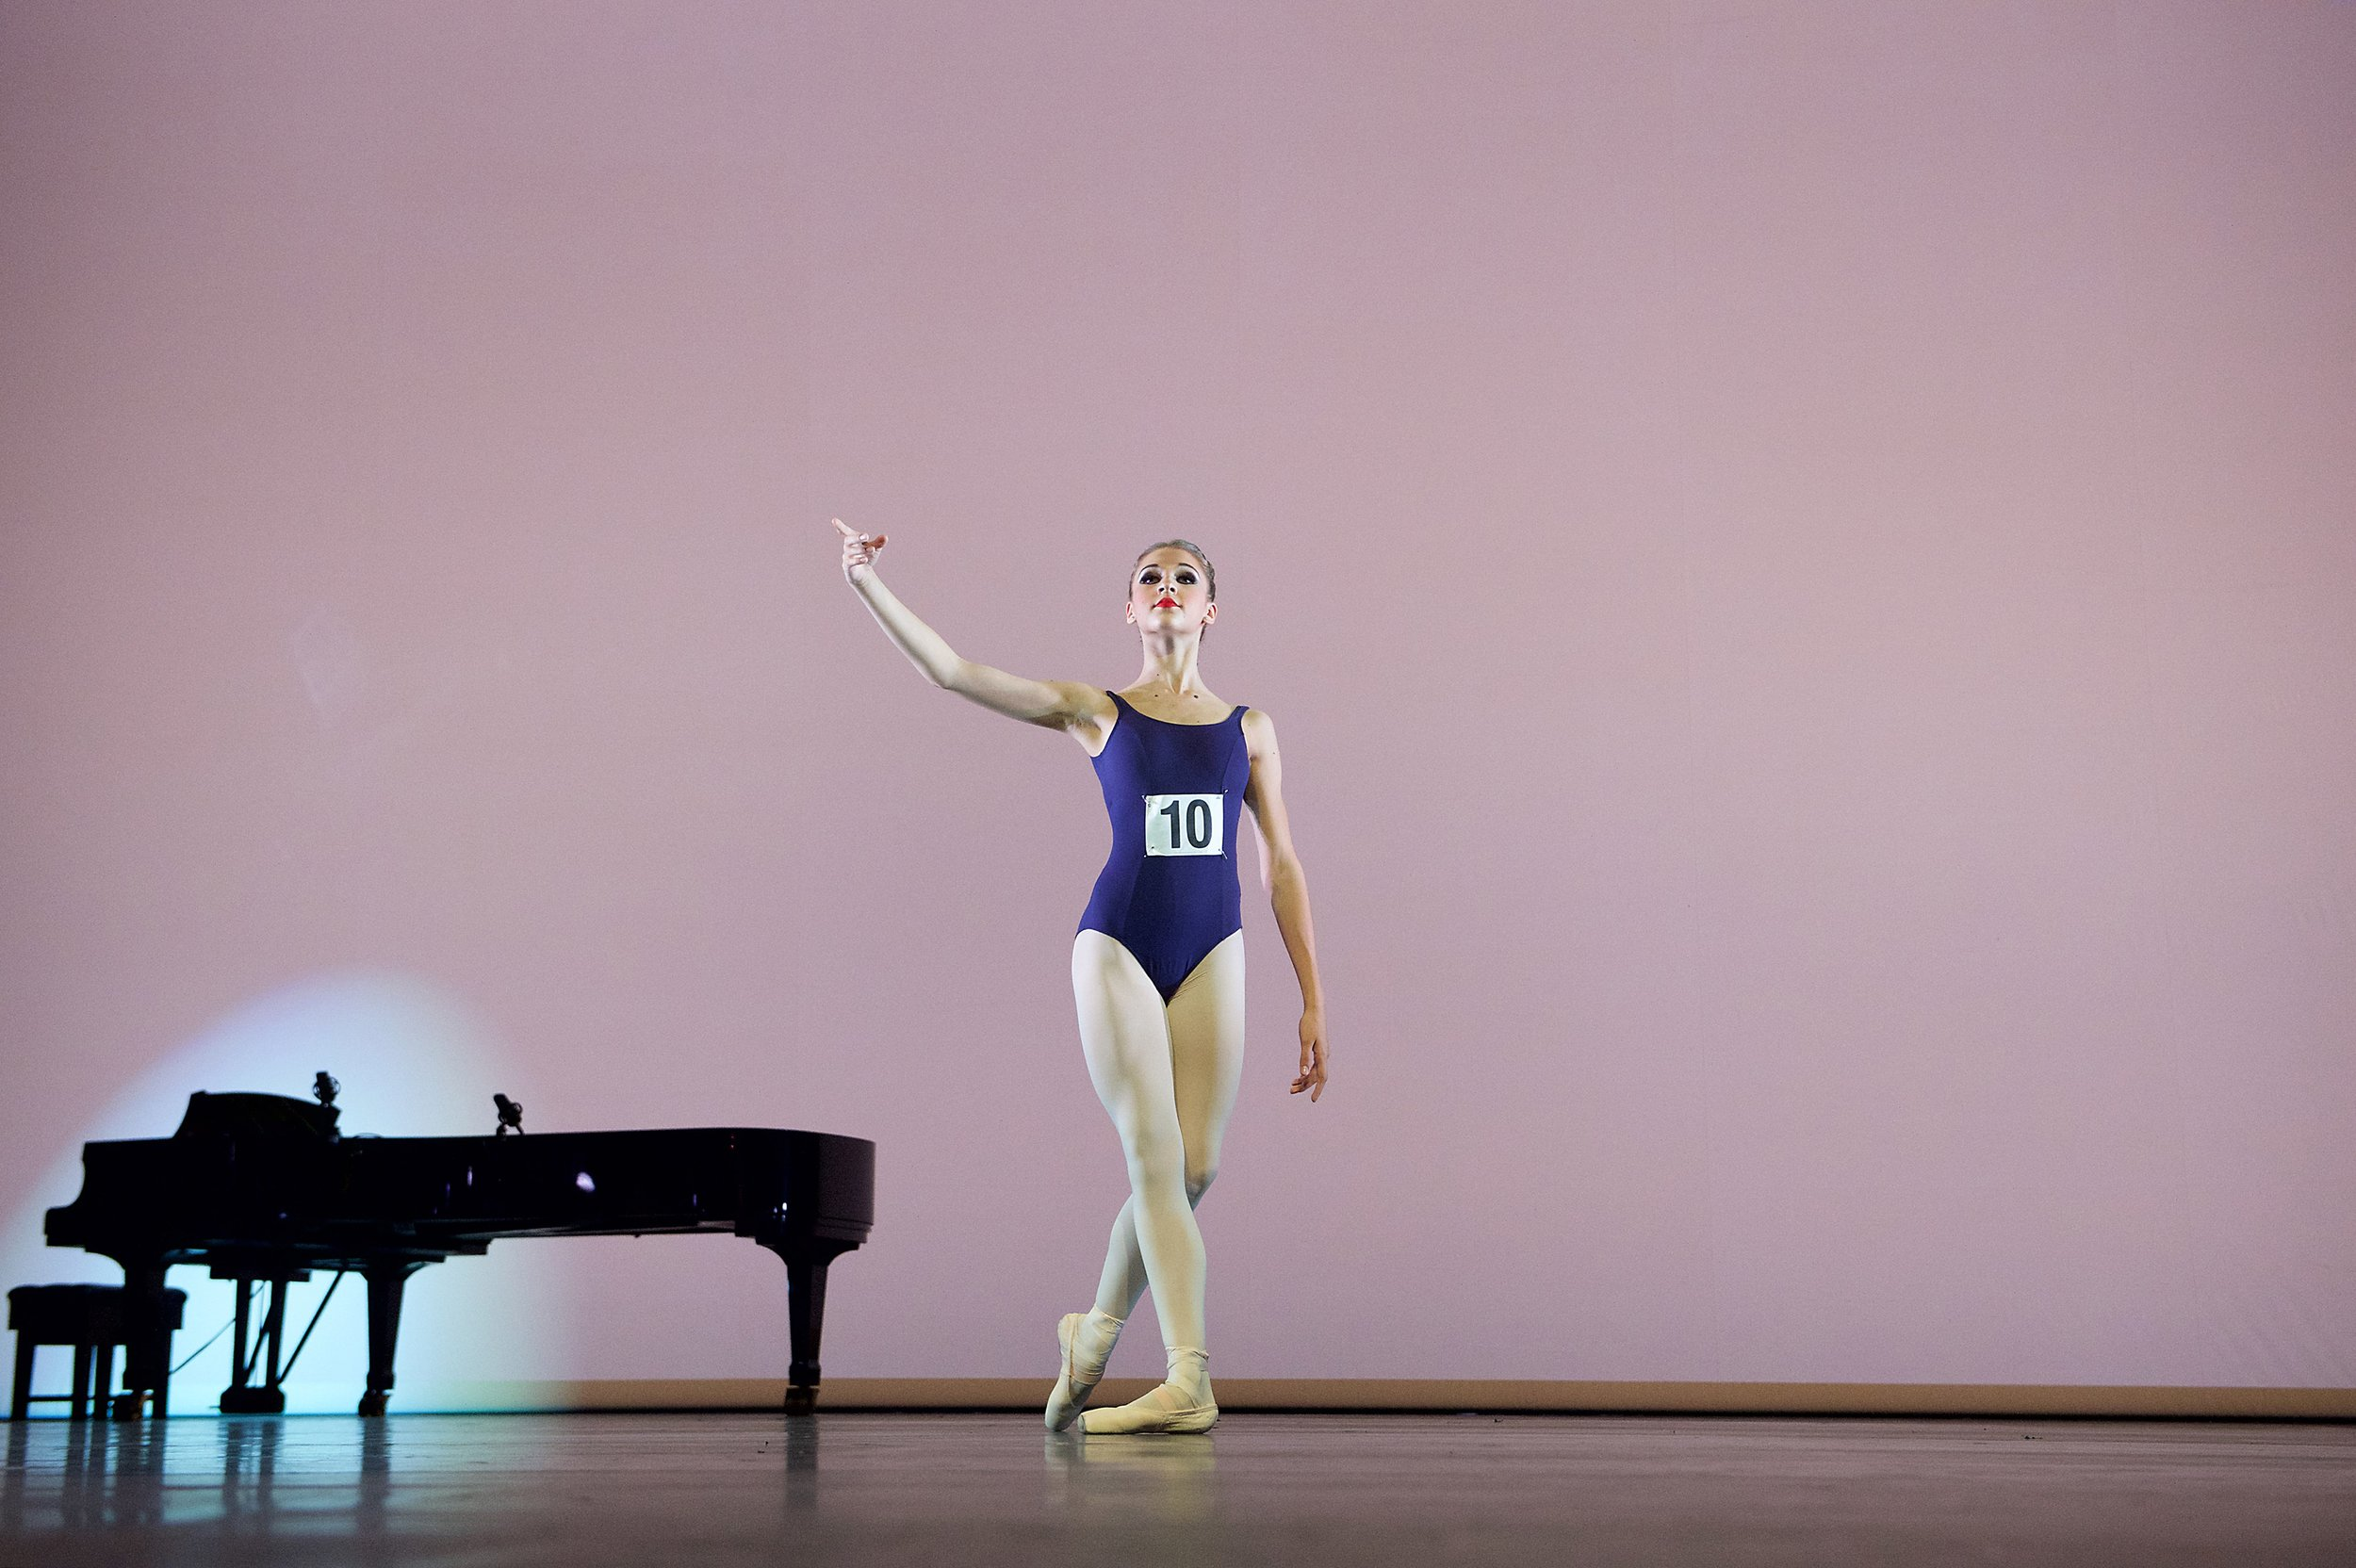 Photo by Elliott Franks, courtesy of the Royal Academy of Dance